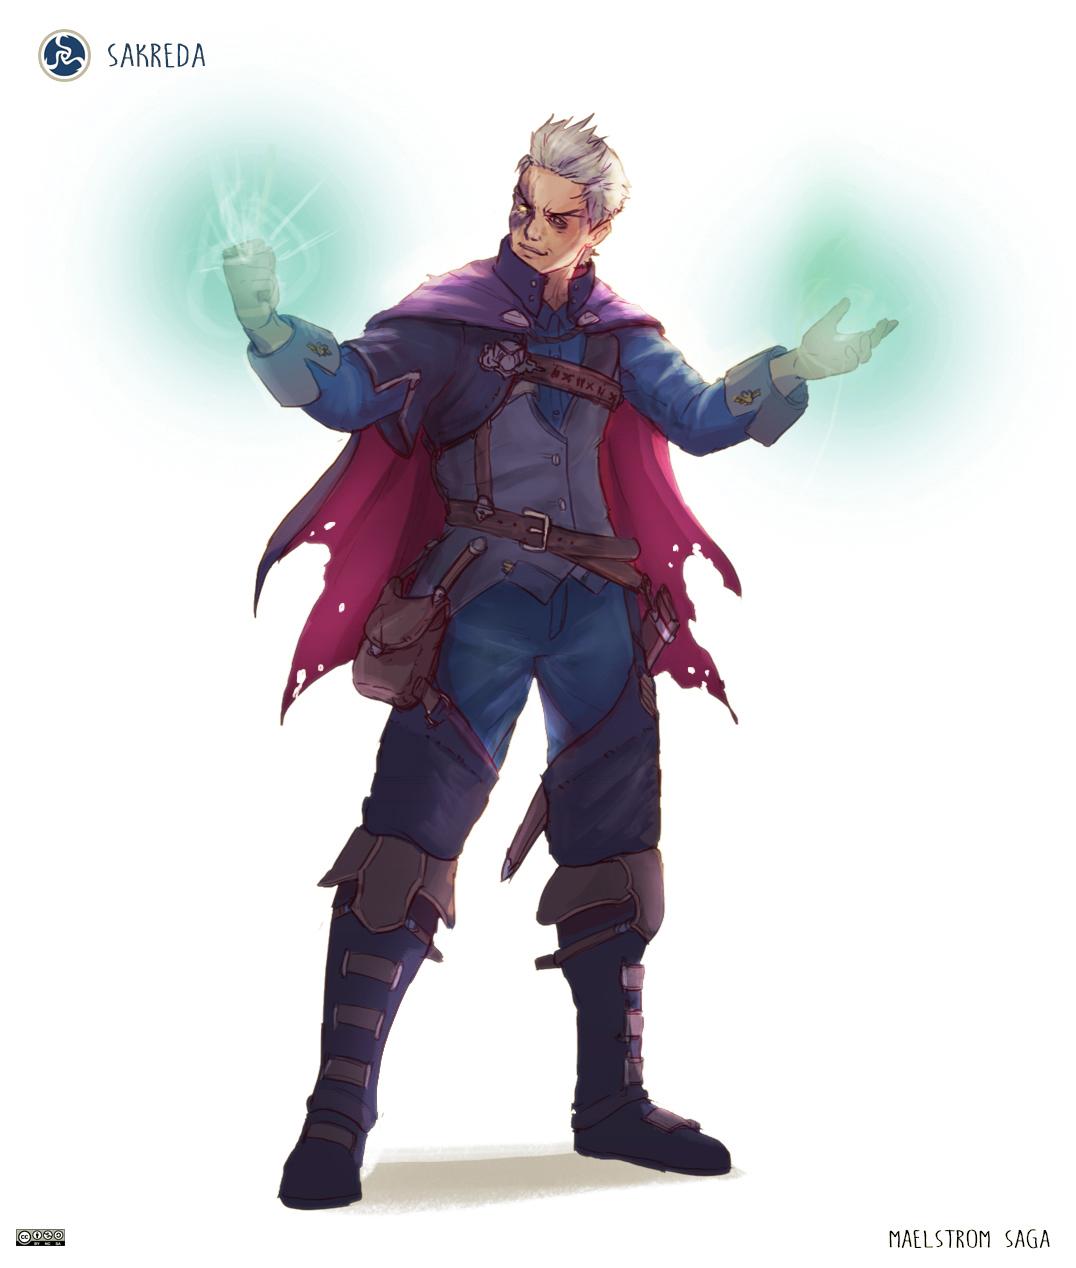 Maelstrom Saga - Villain